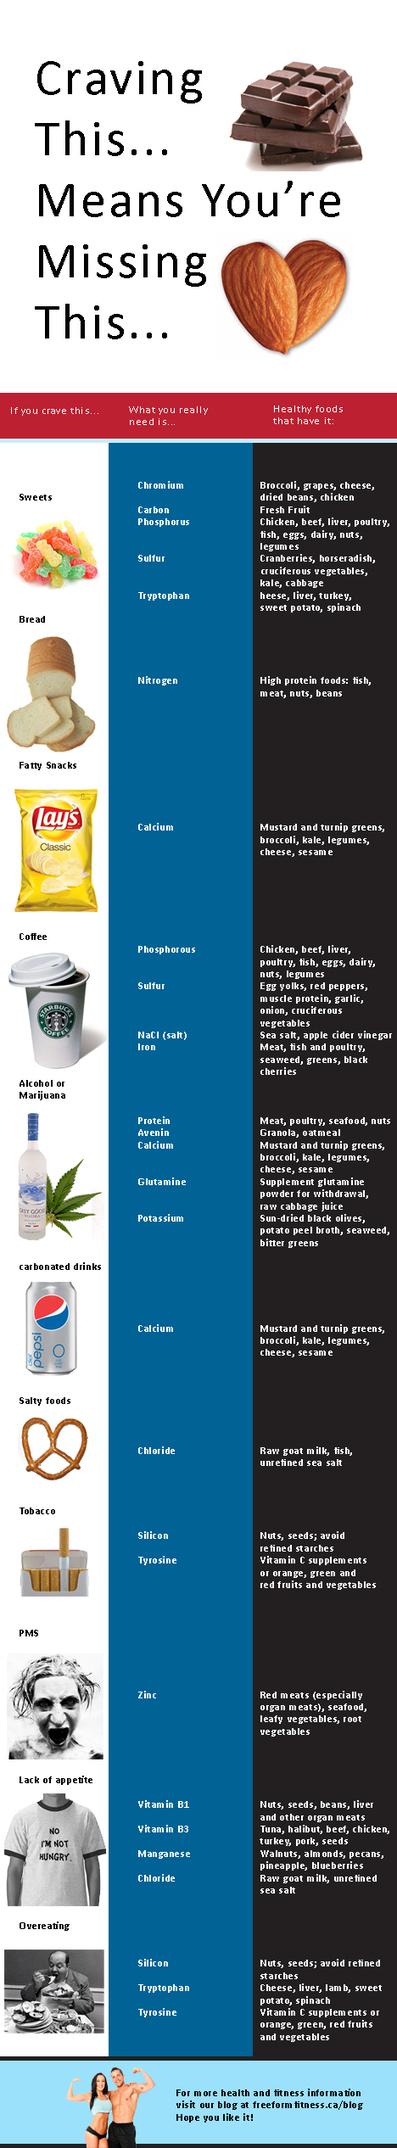 cravings1.jpg (468x2532 pixels) | Health, Nutrition and Supplements | Scoop.it